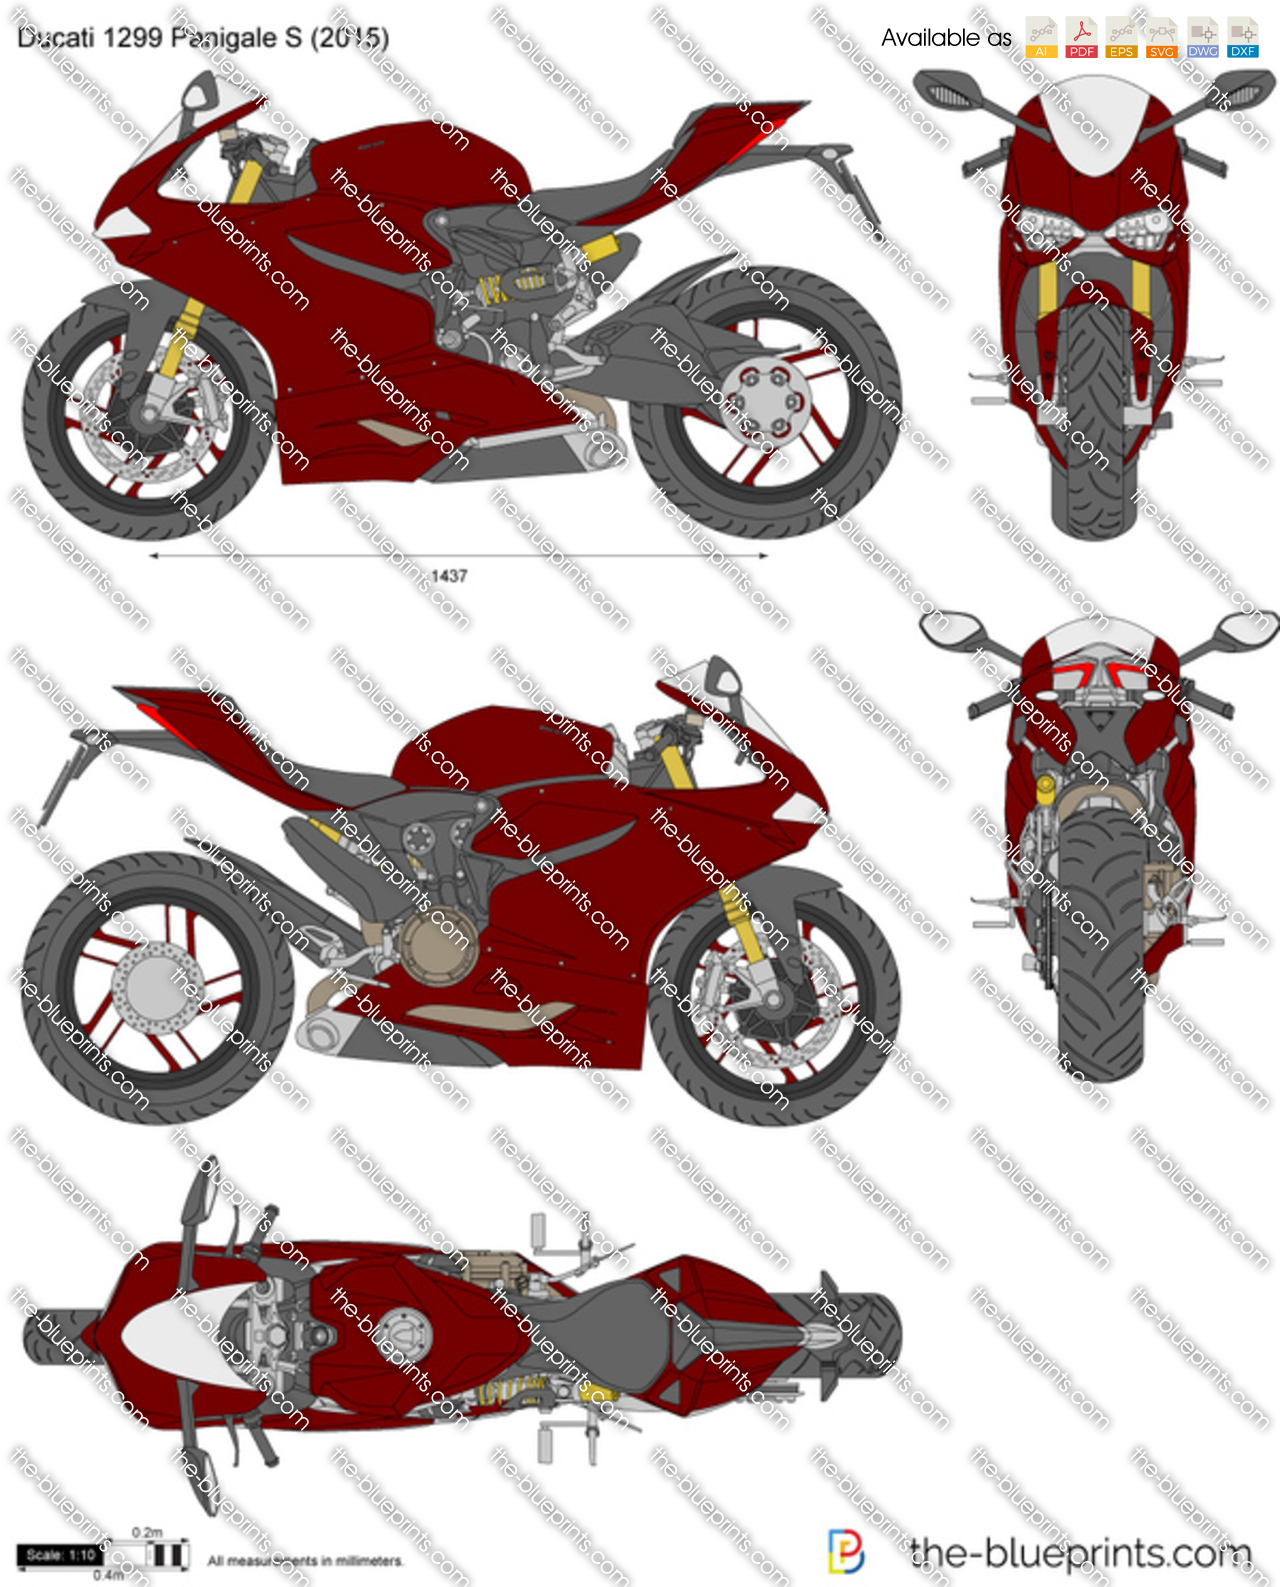 Ducati Panigale Blueprint Ducati 1299 Panigale s